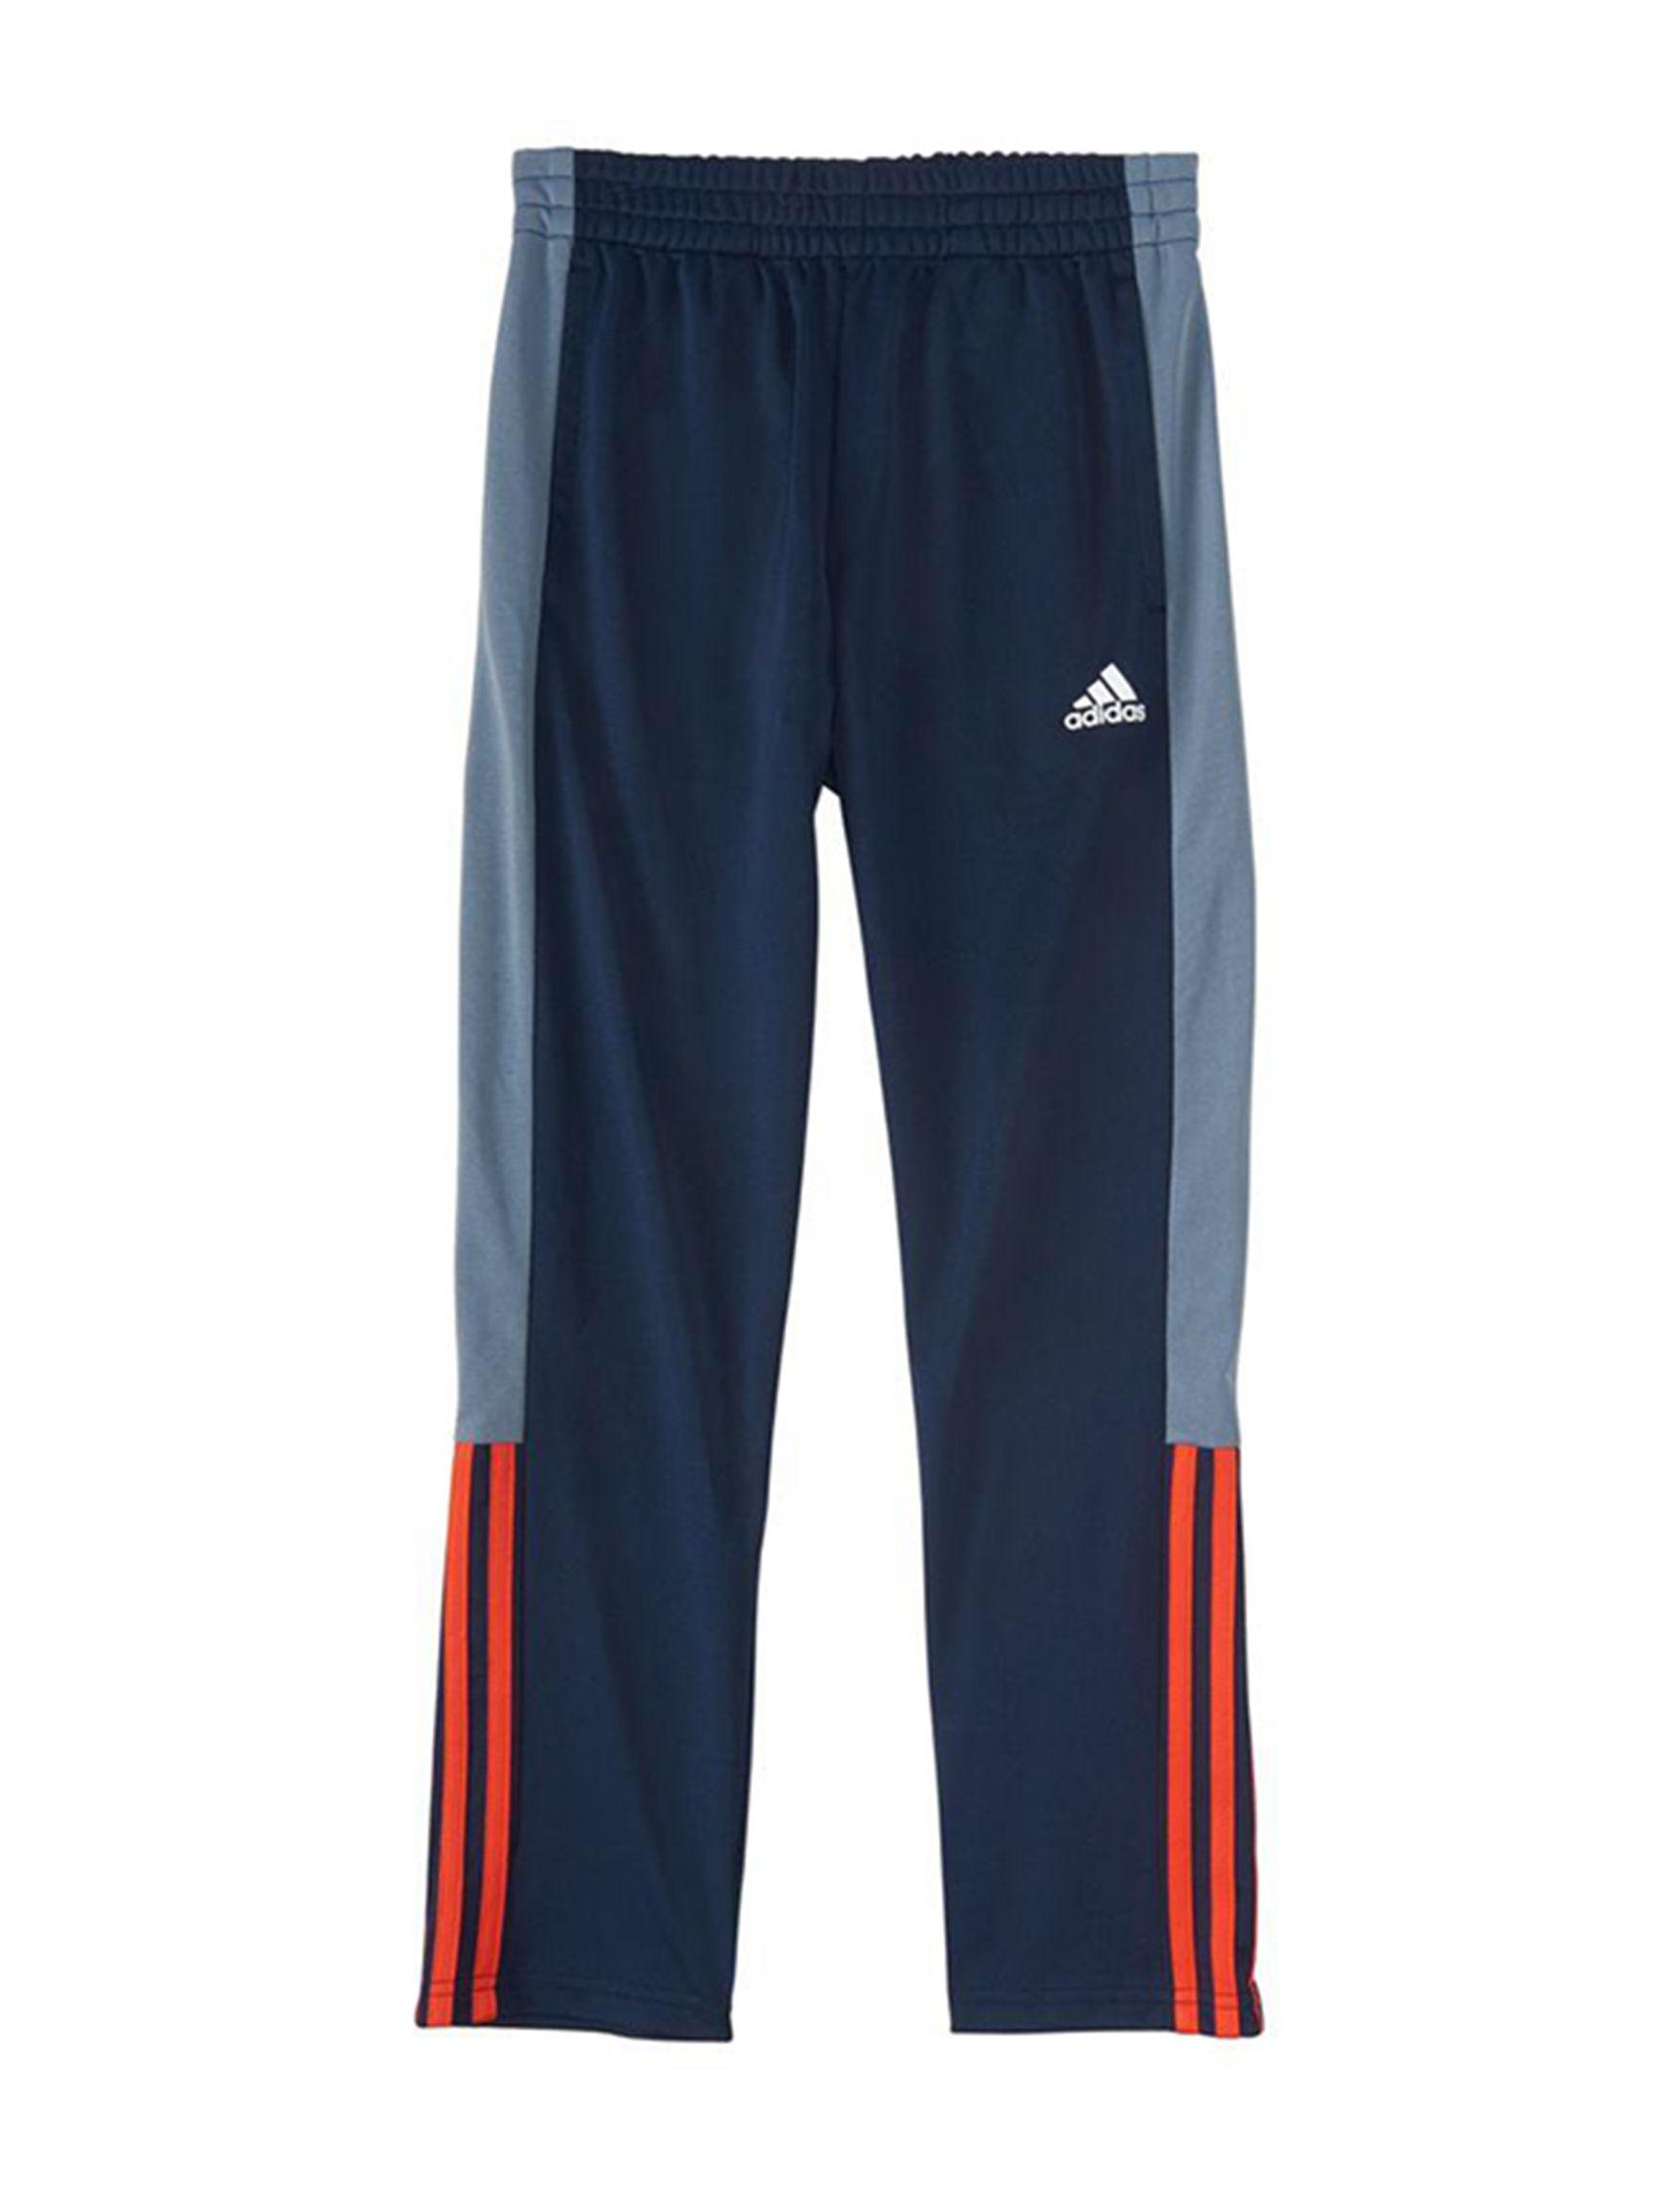 Adidas Navy Soft Pants